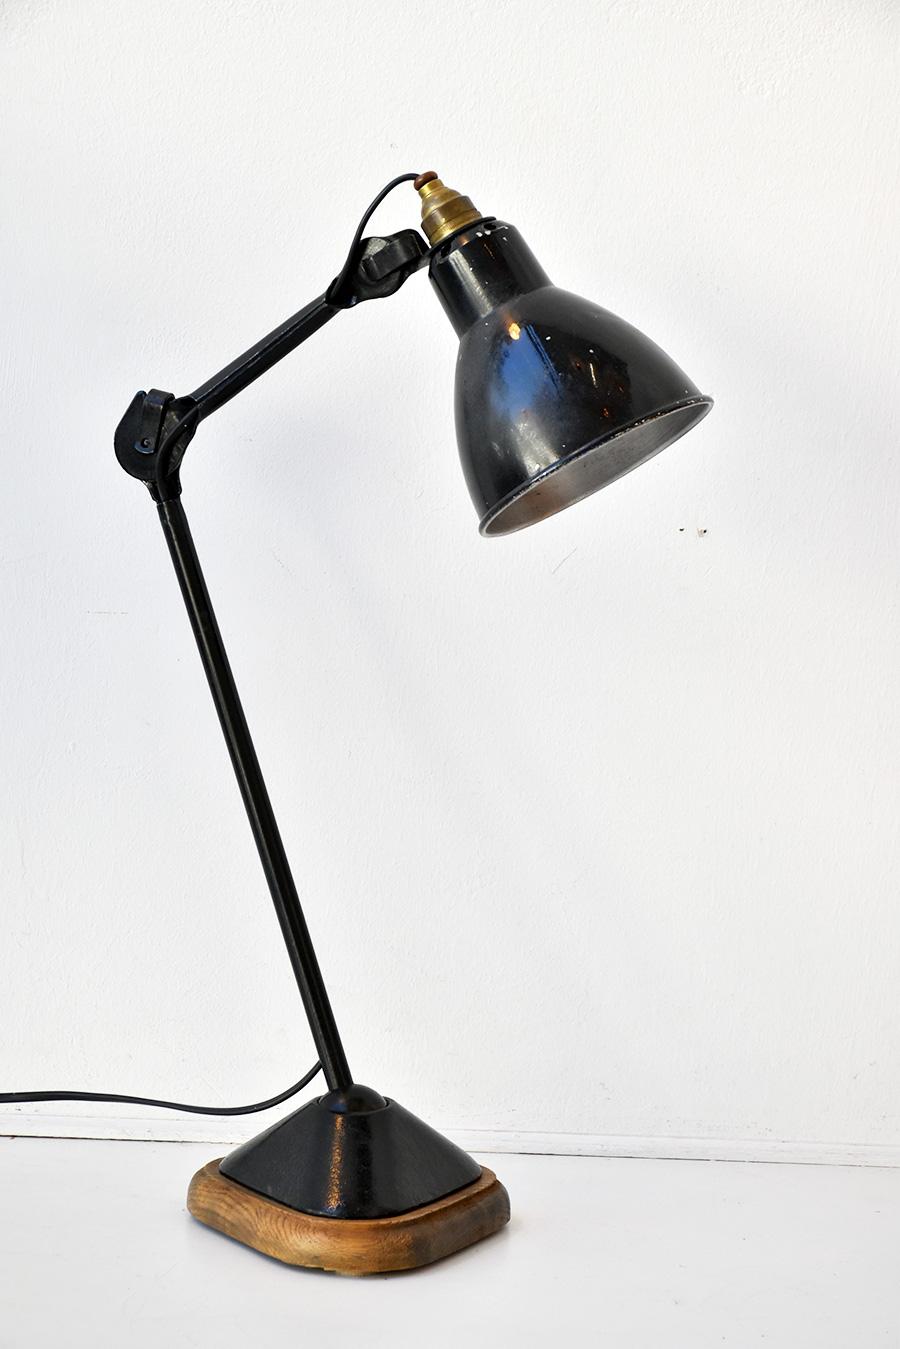 Desk lamp 2016, Bernard-Albin Gras, Didier de Gachons, 1922.